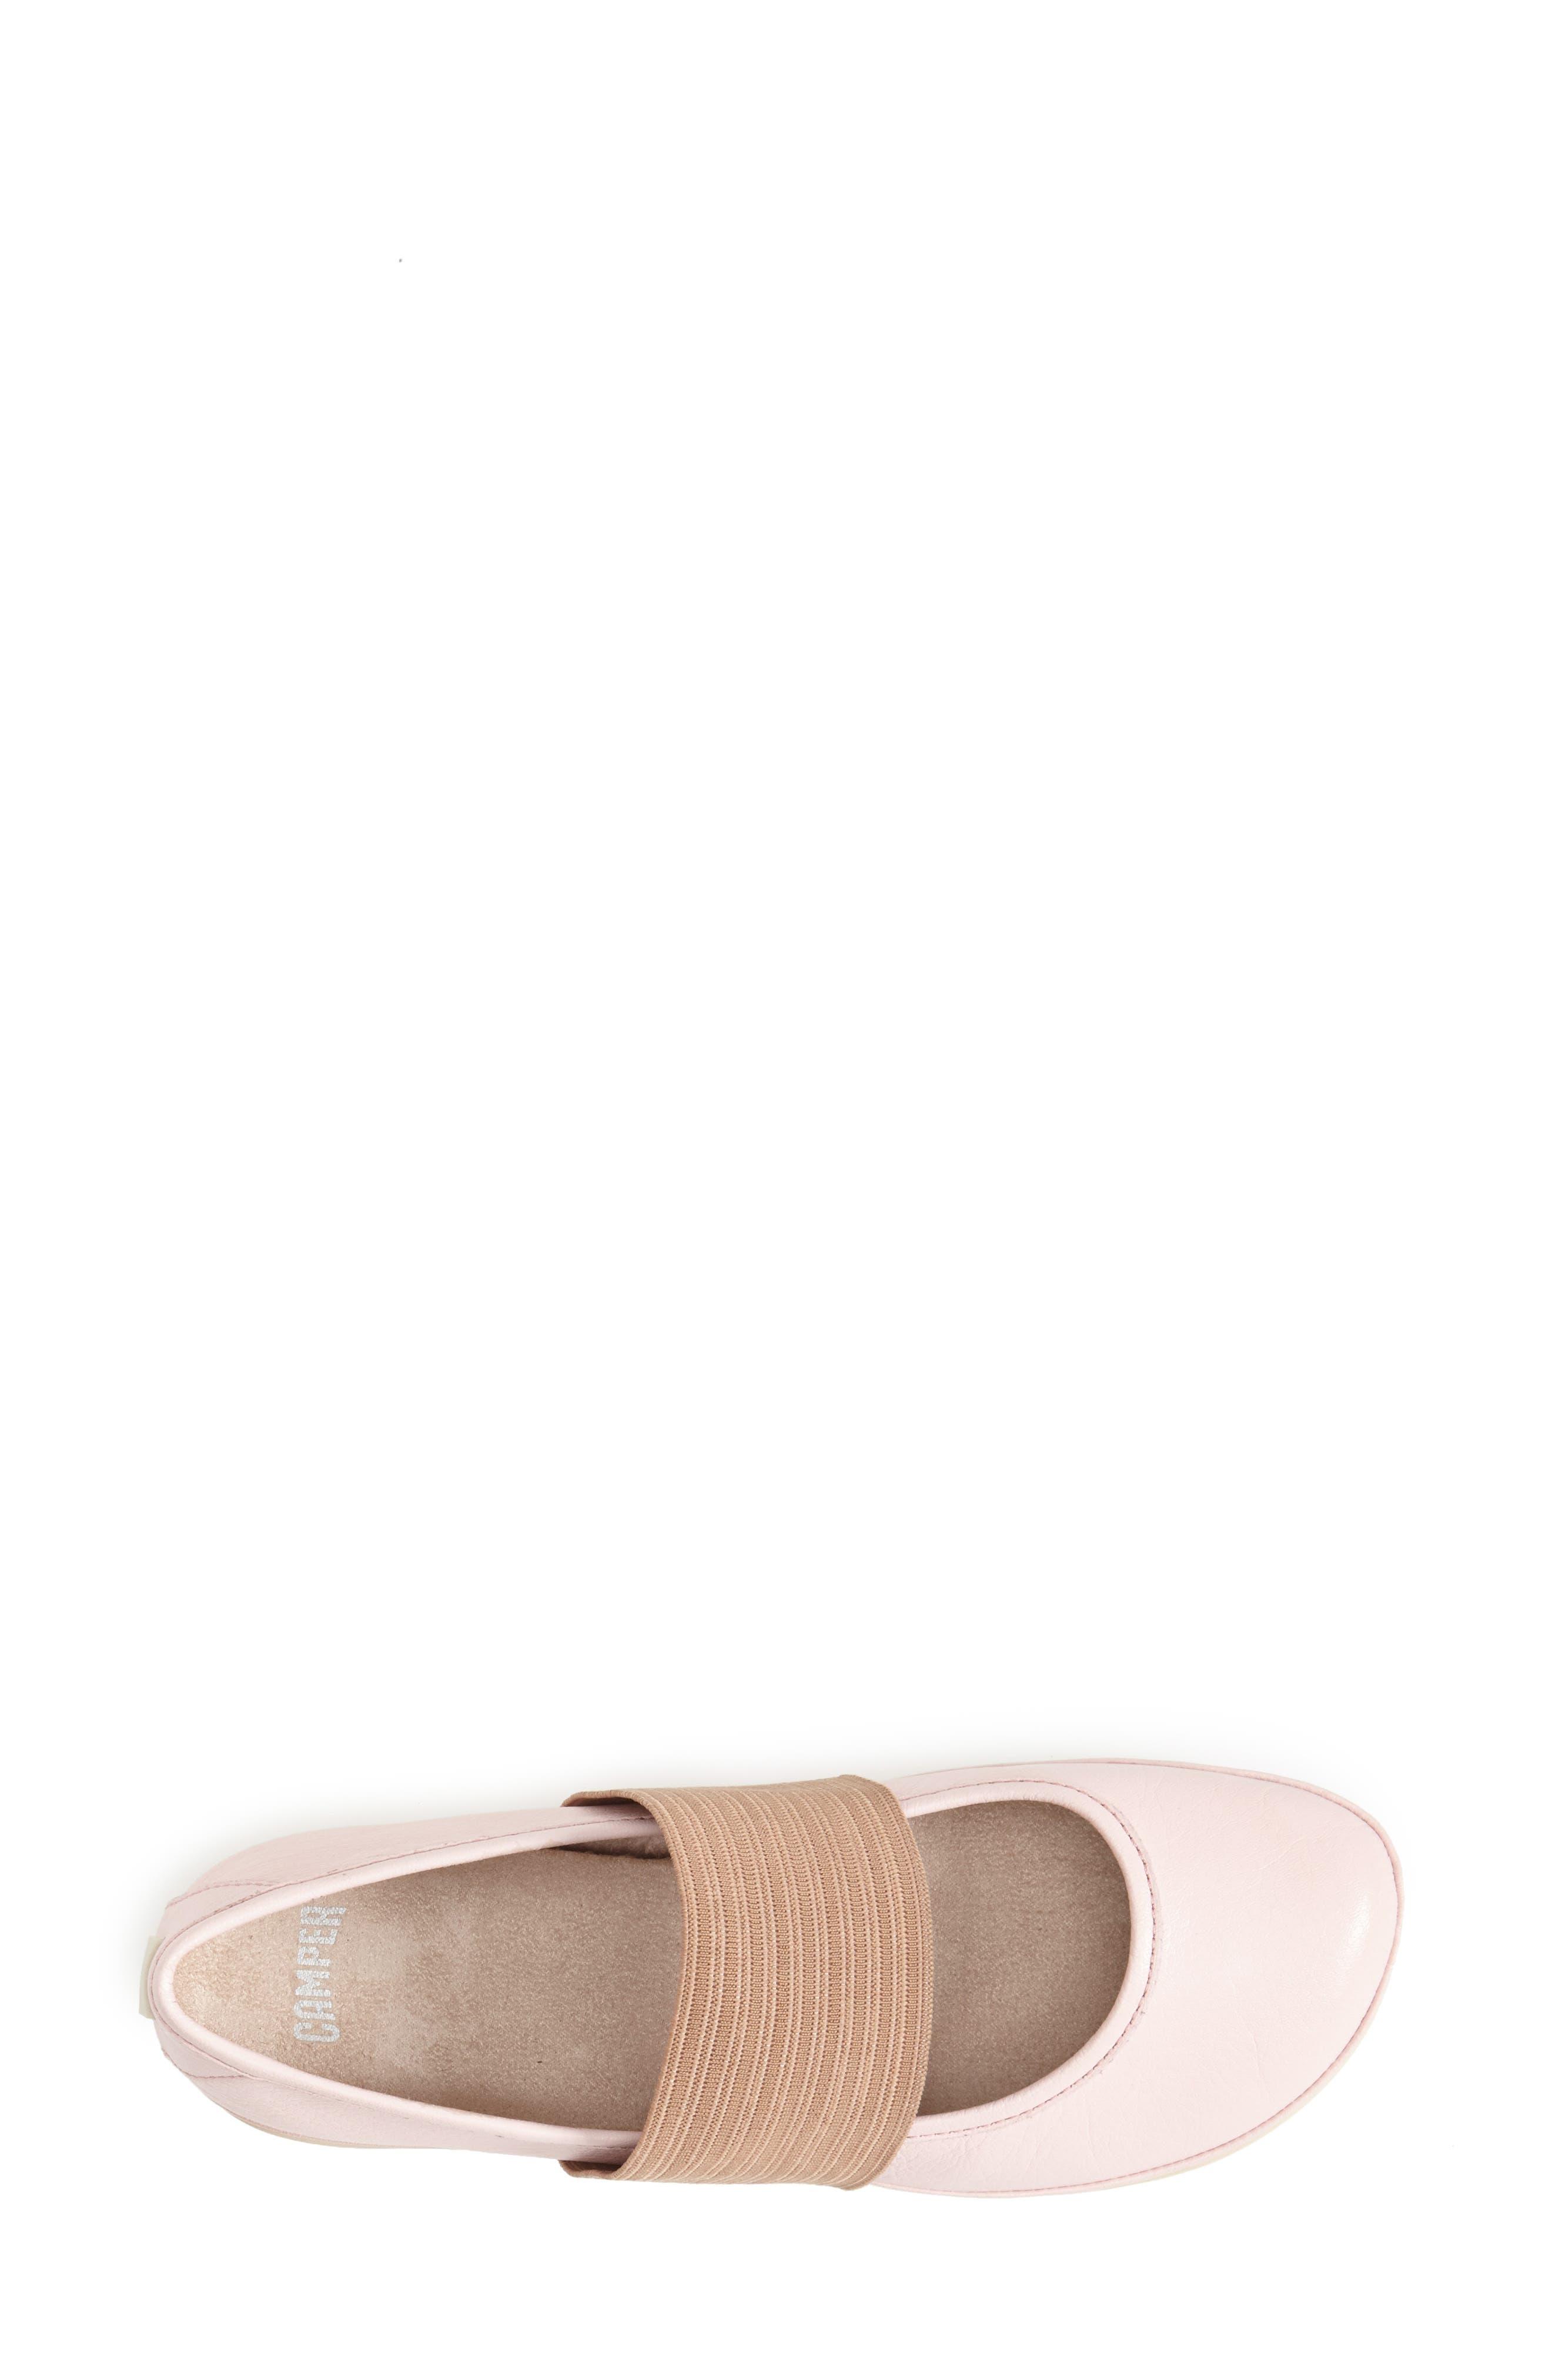 'Right Nina' Leather Ballerina Flat,                             Alternate thumbnail 74, color,